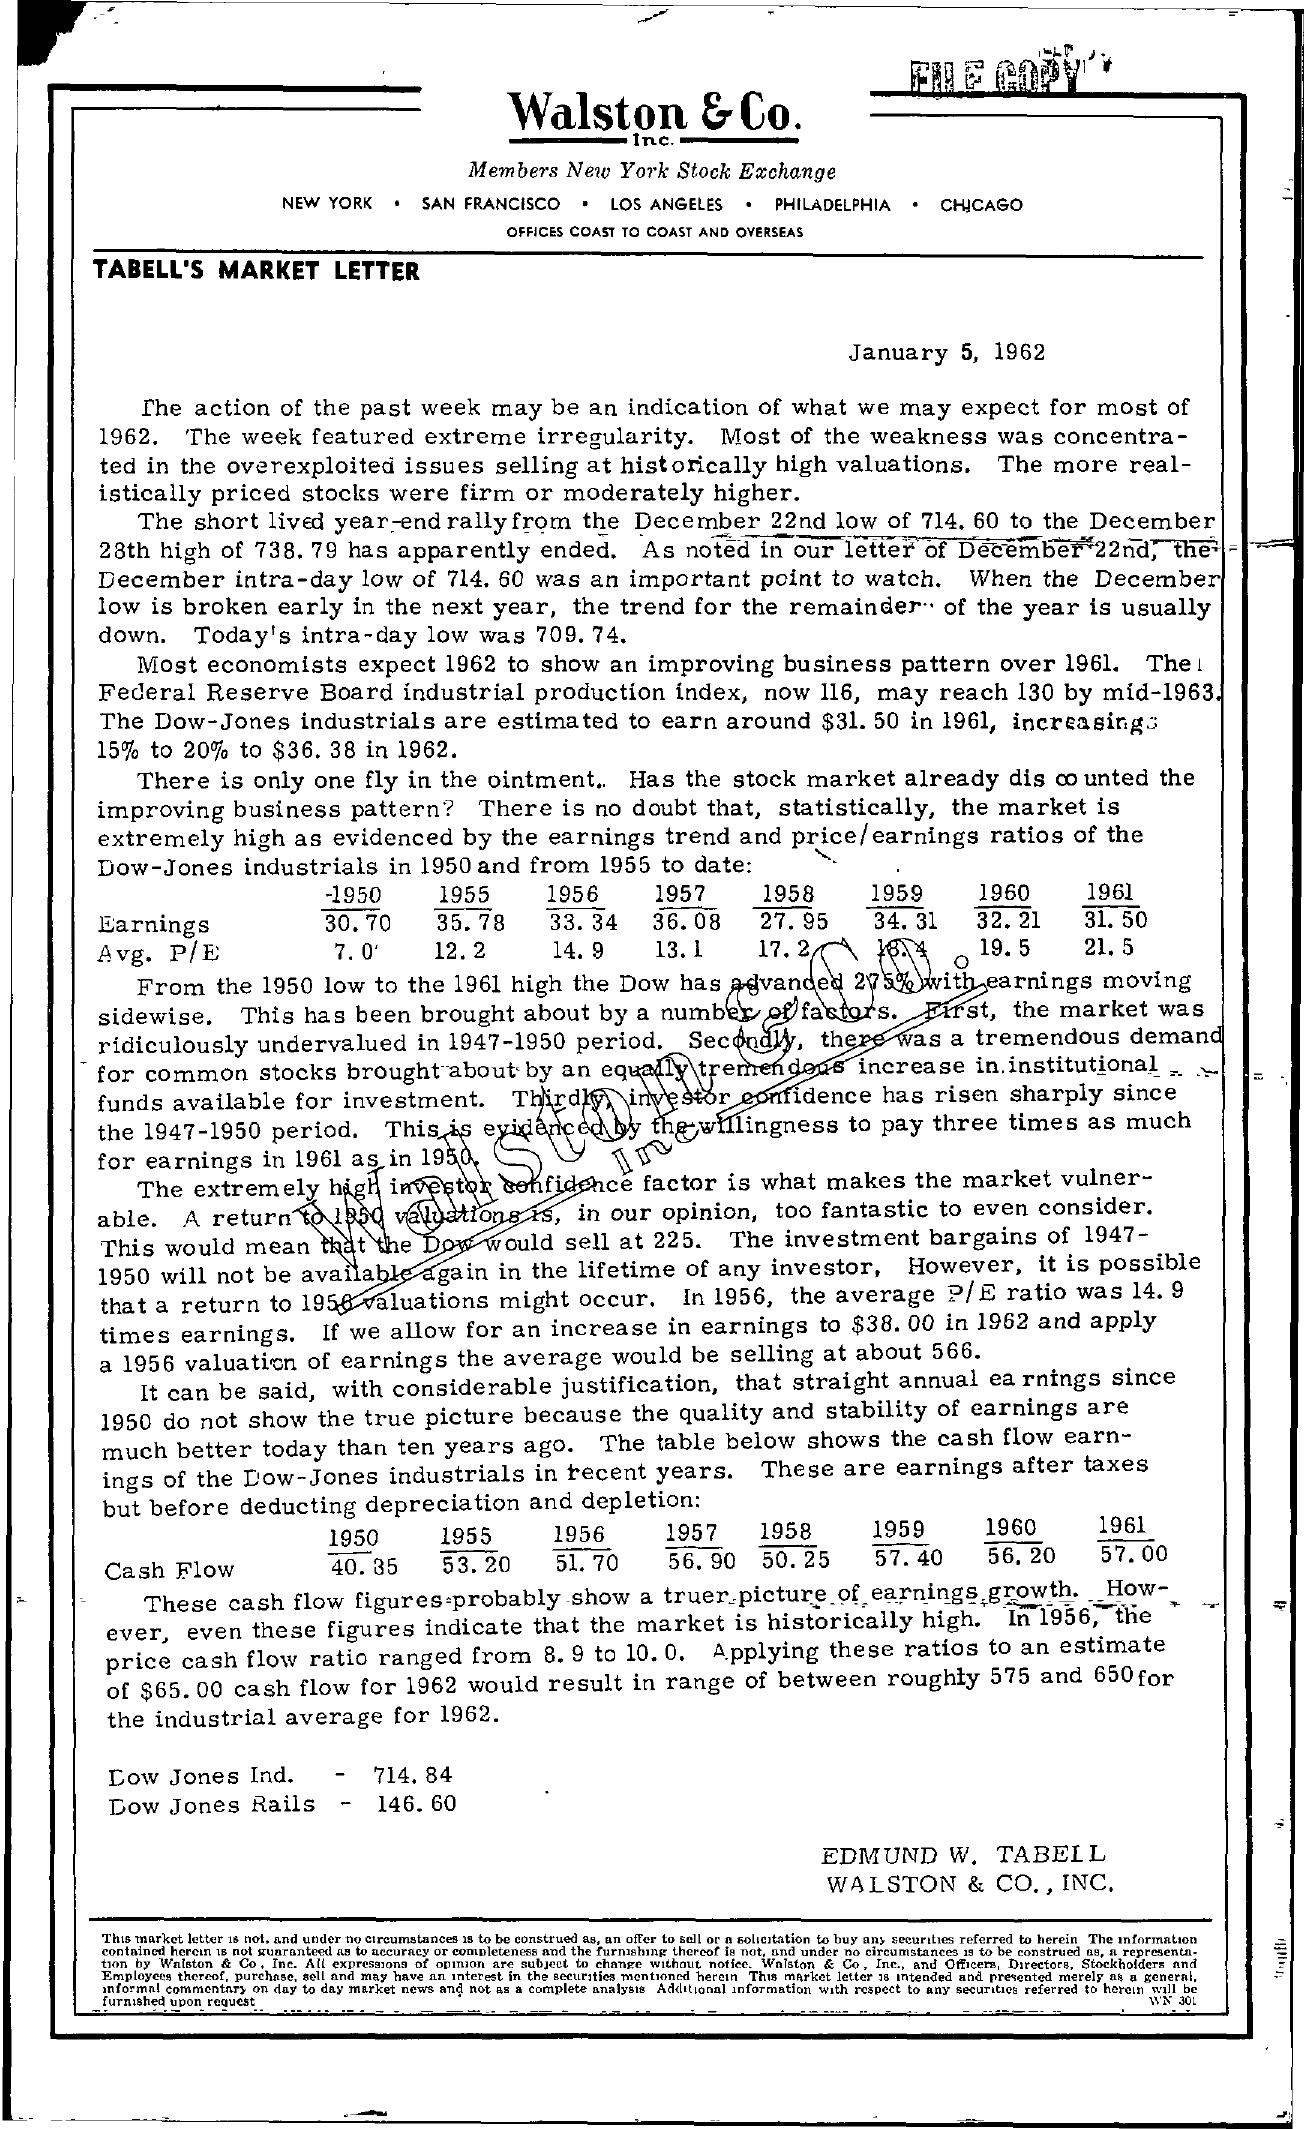 Tabell's Market Letter - January 05, 1962